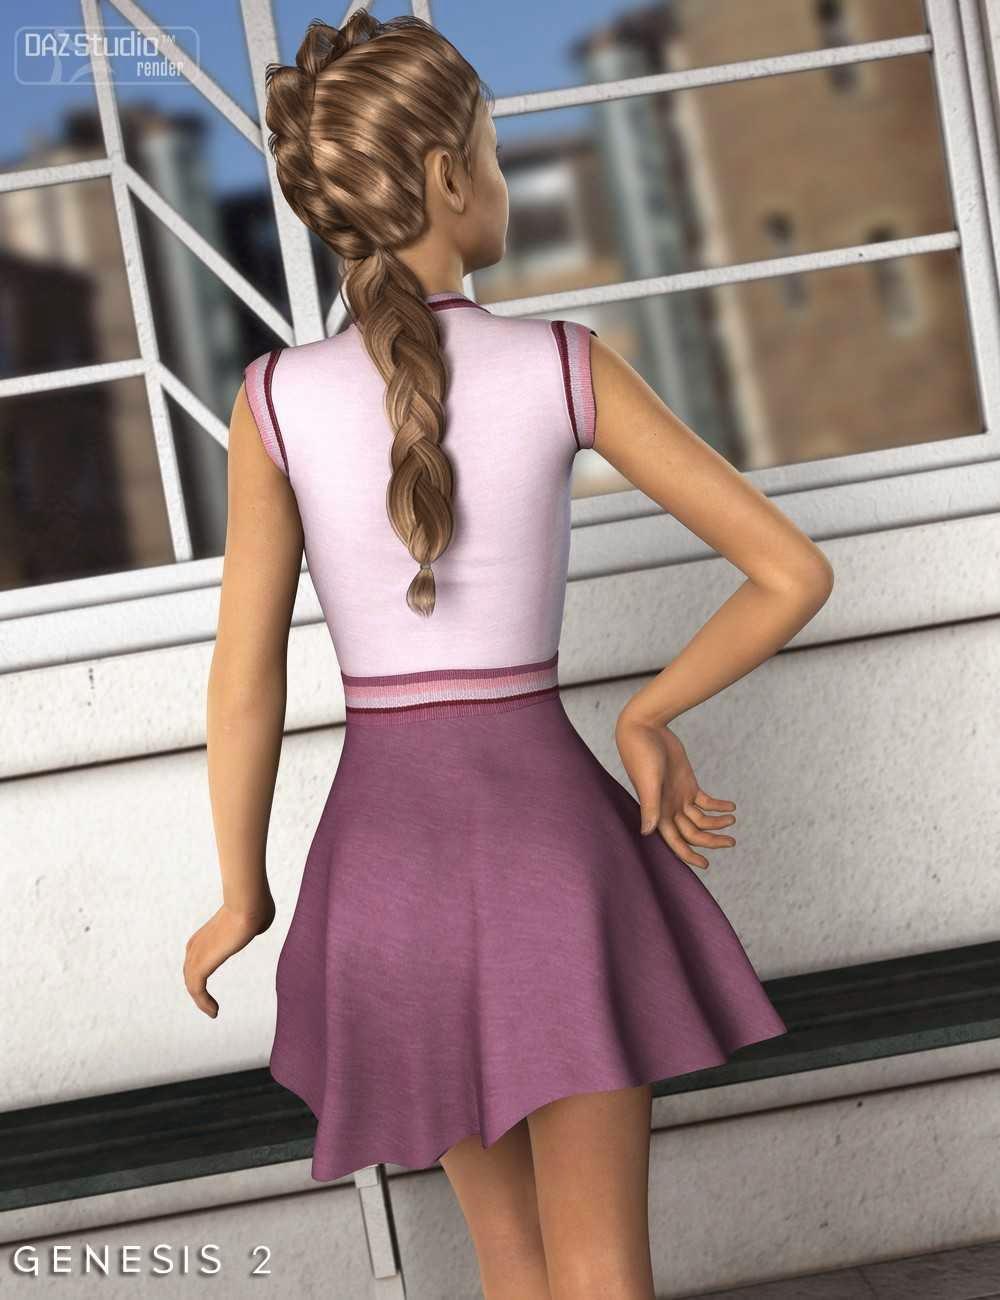 Robe patineuse pour Genesis 2 Femme